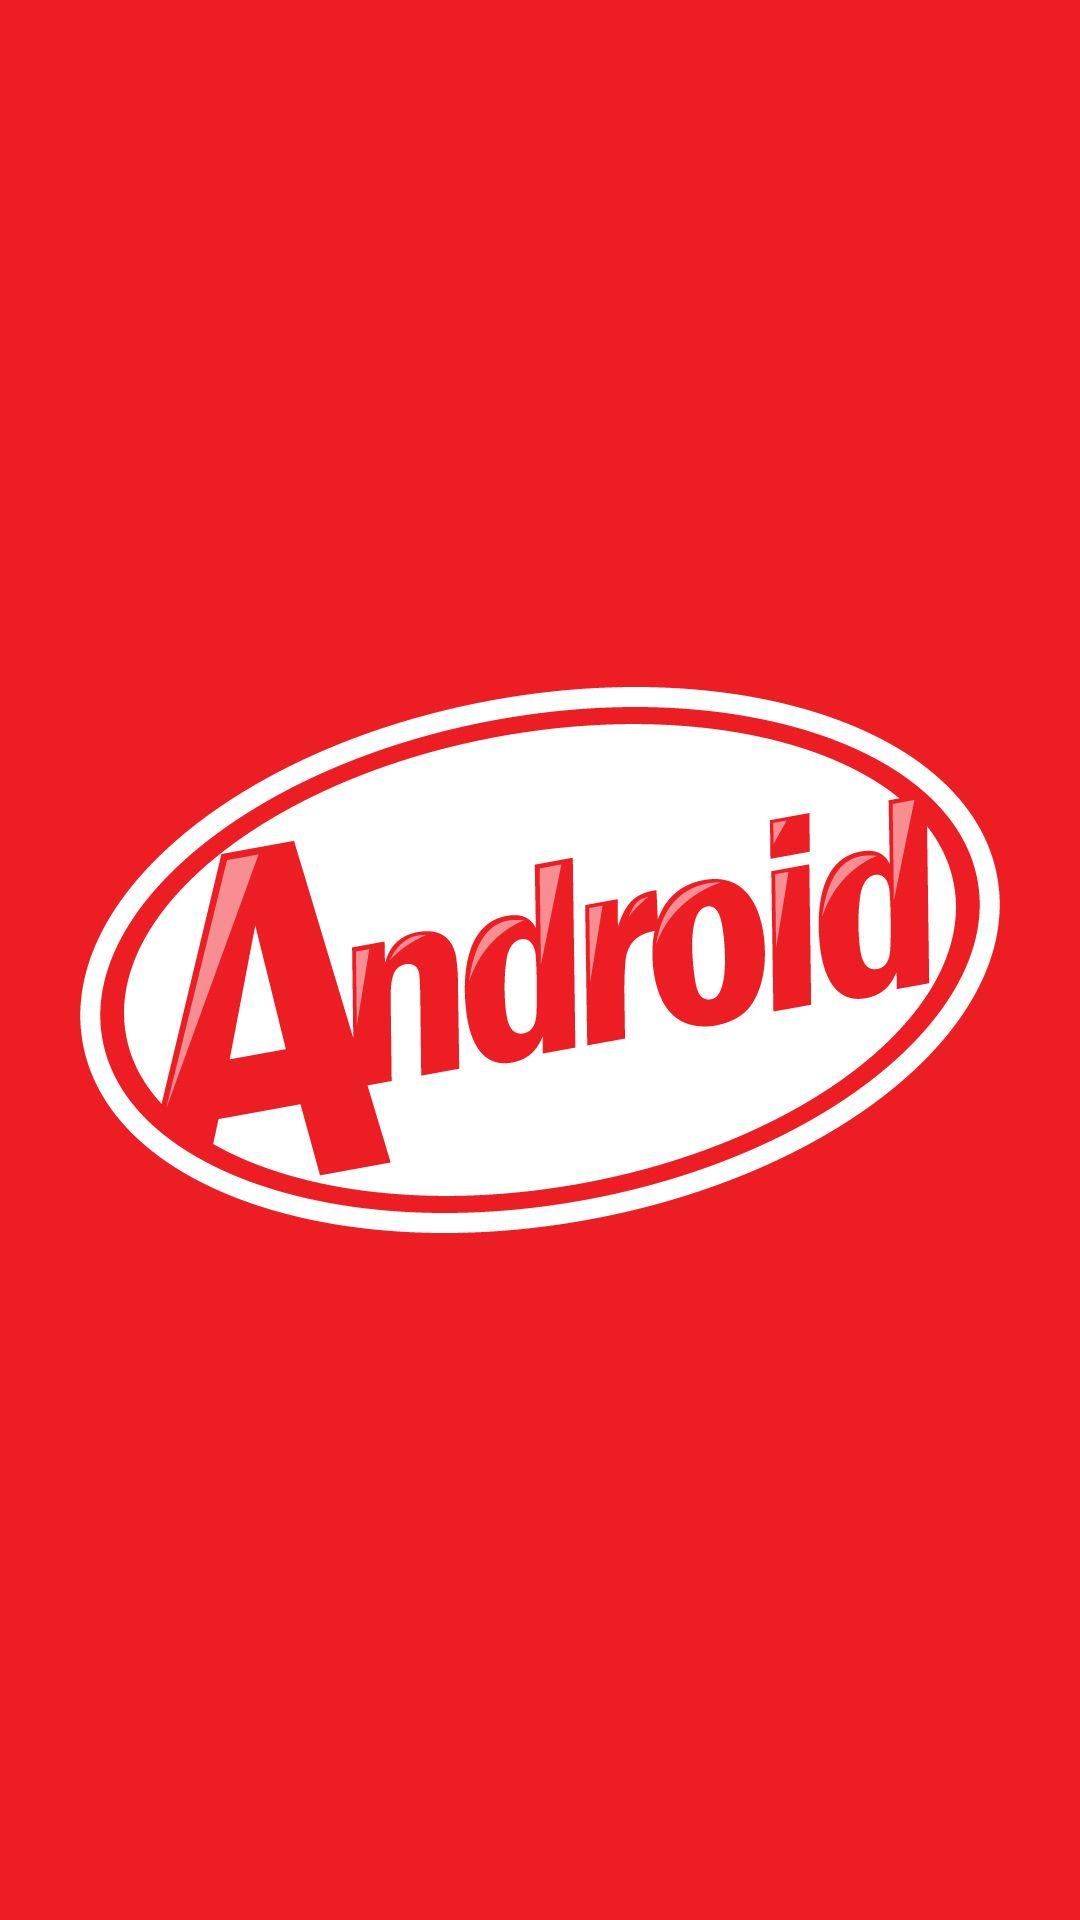 Android KitKat 4.4.2 Logo #wallpaper